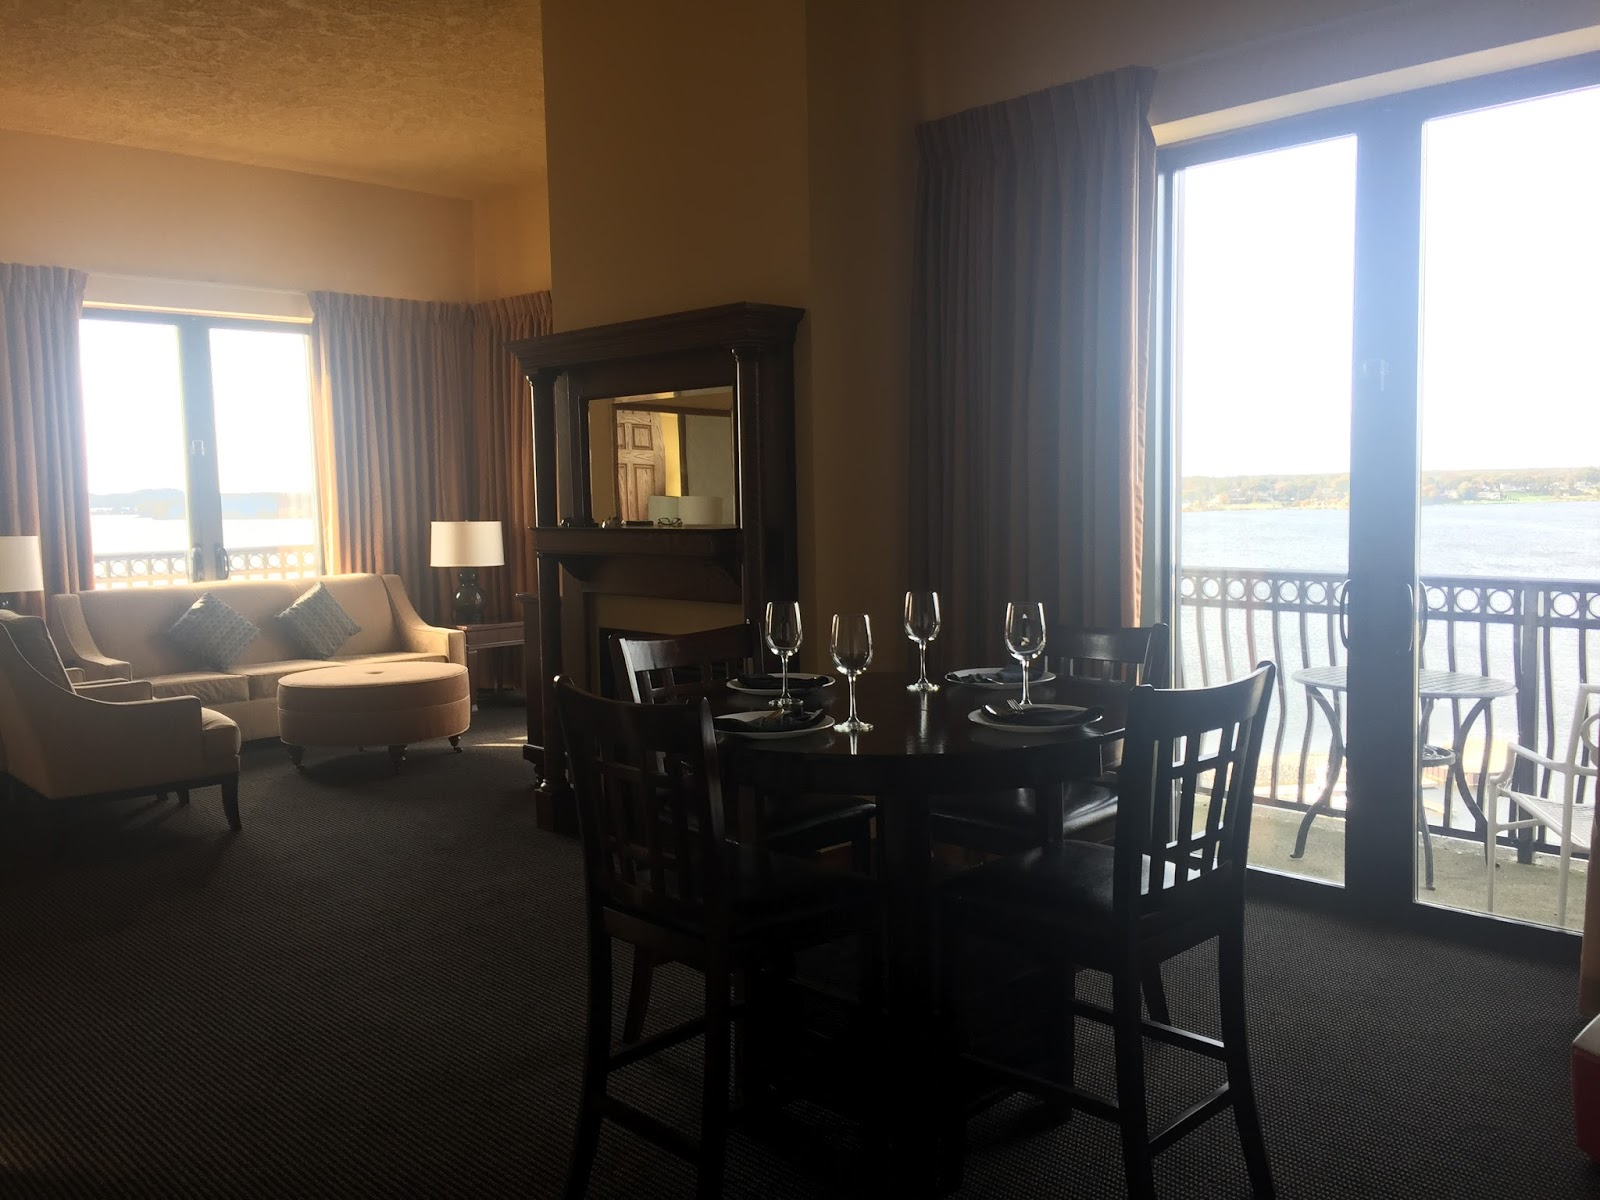 Penthouse Suite 1003